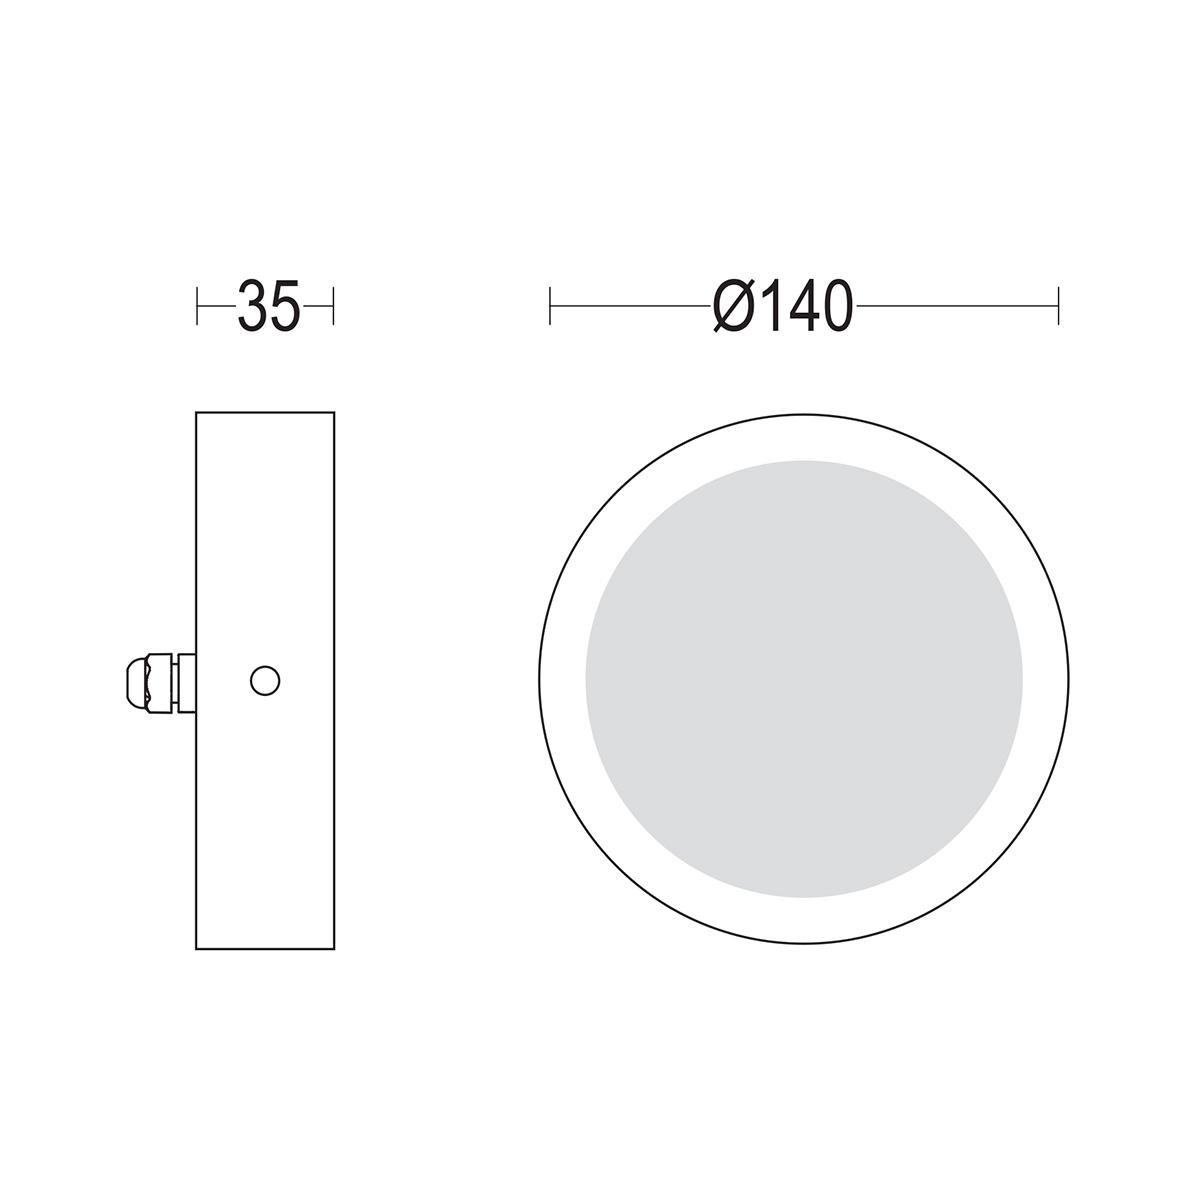 чертеж Midispia flat 140 Ghidini уличный светильник GH1386.FAXO300EN